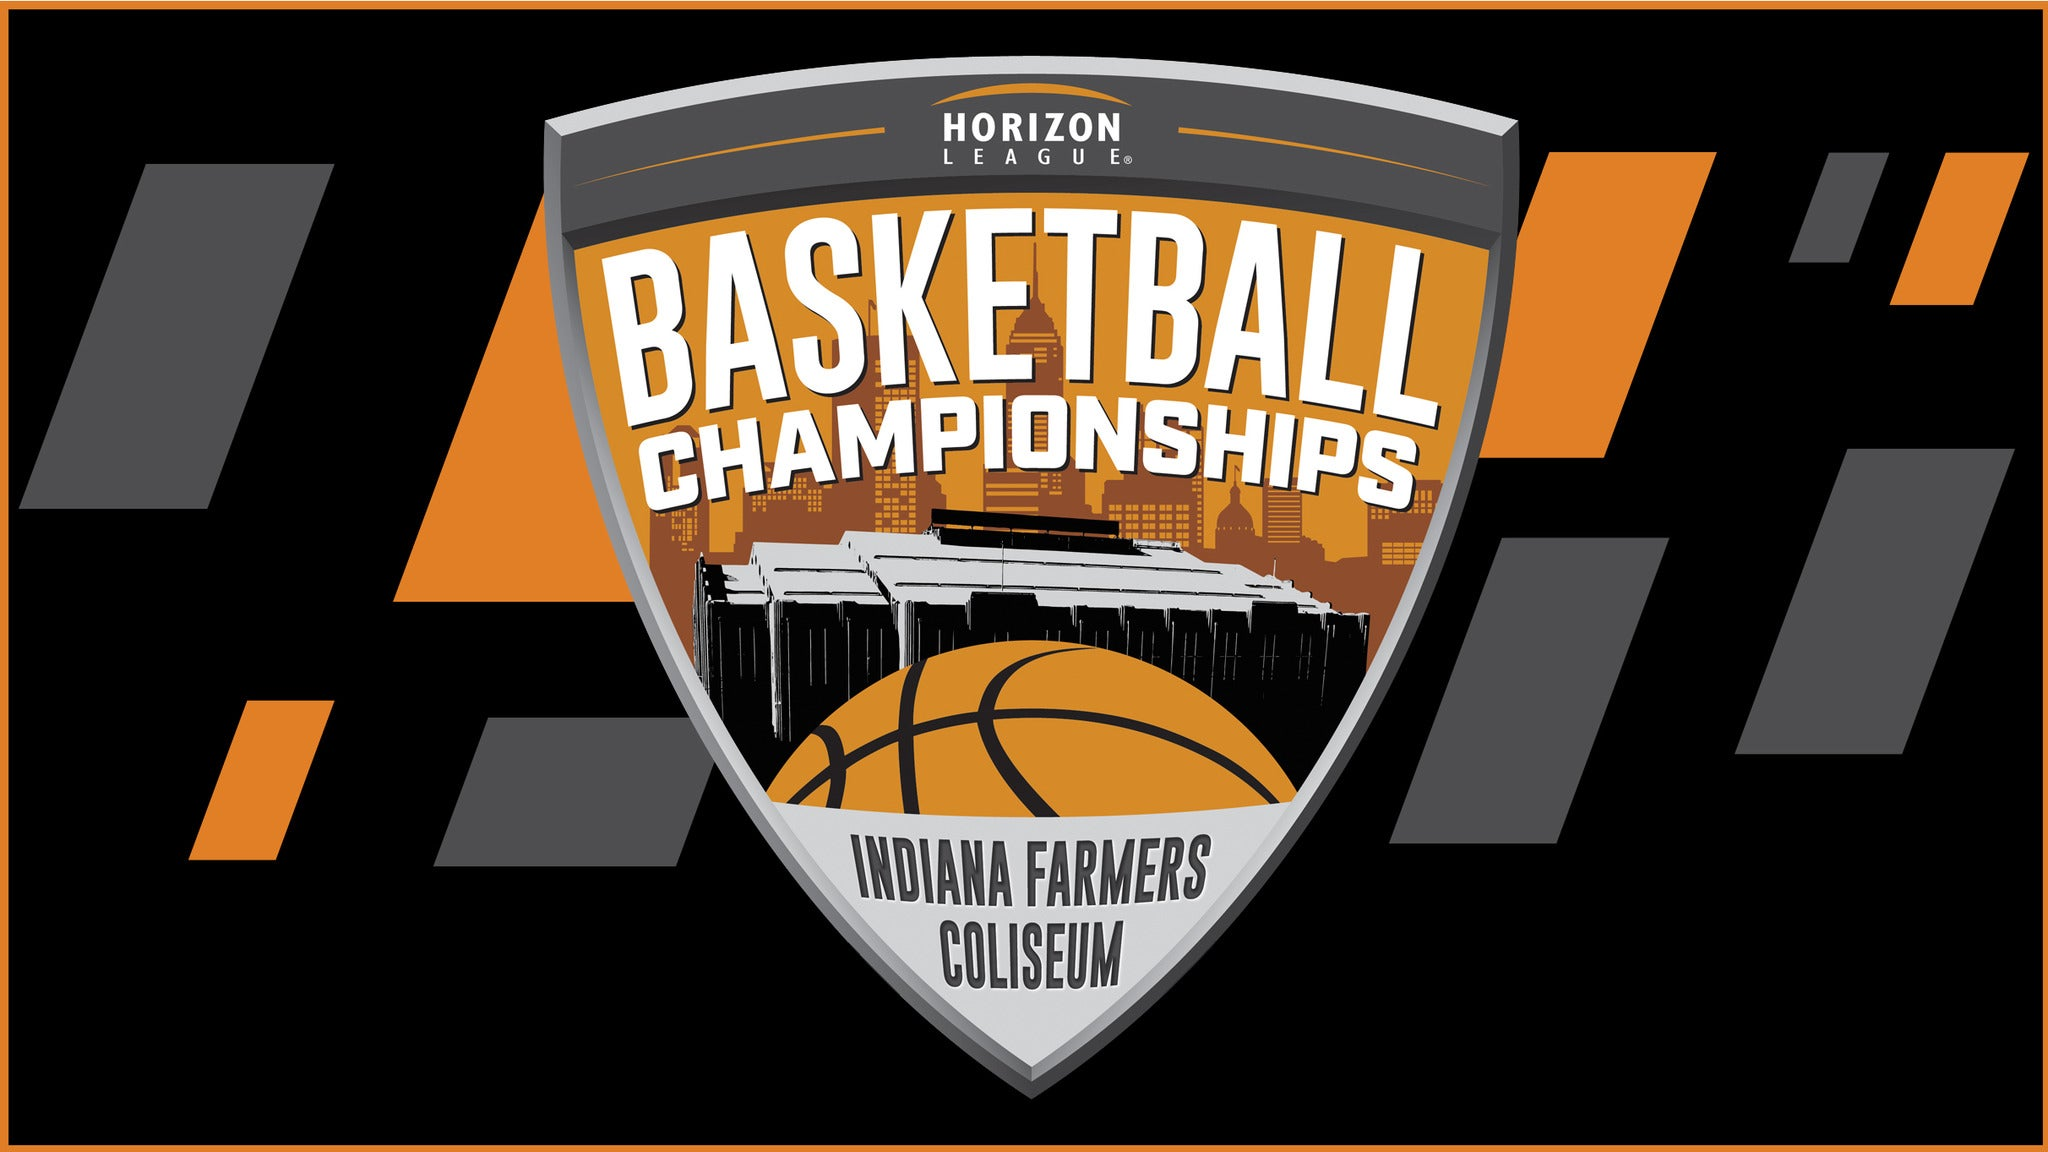 Horizon League Basketball Championships